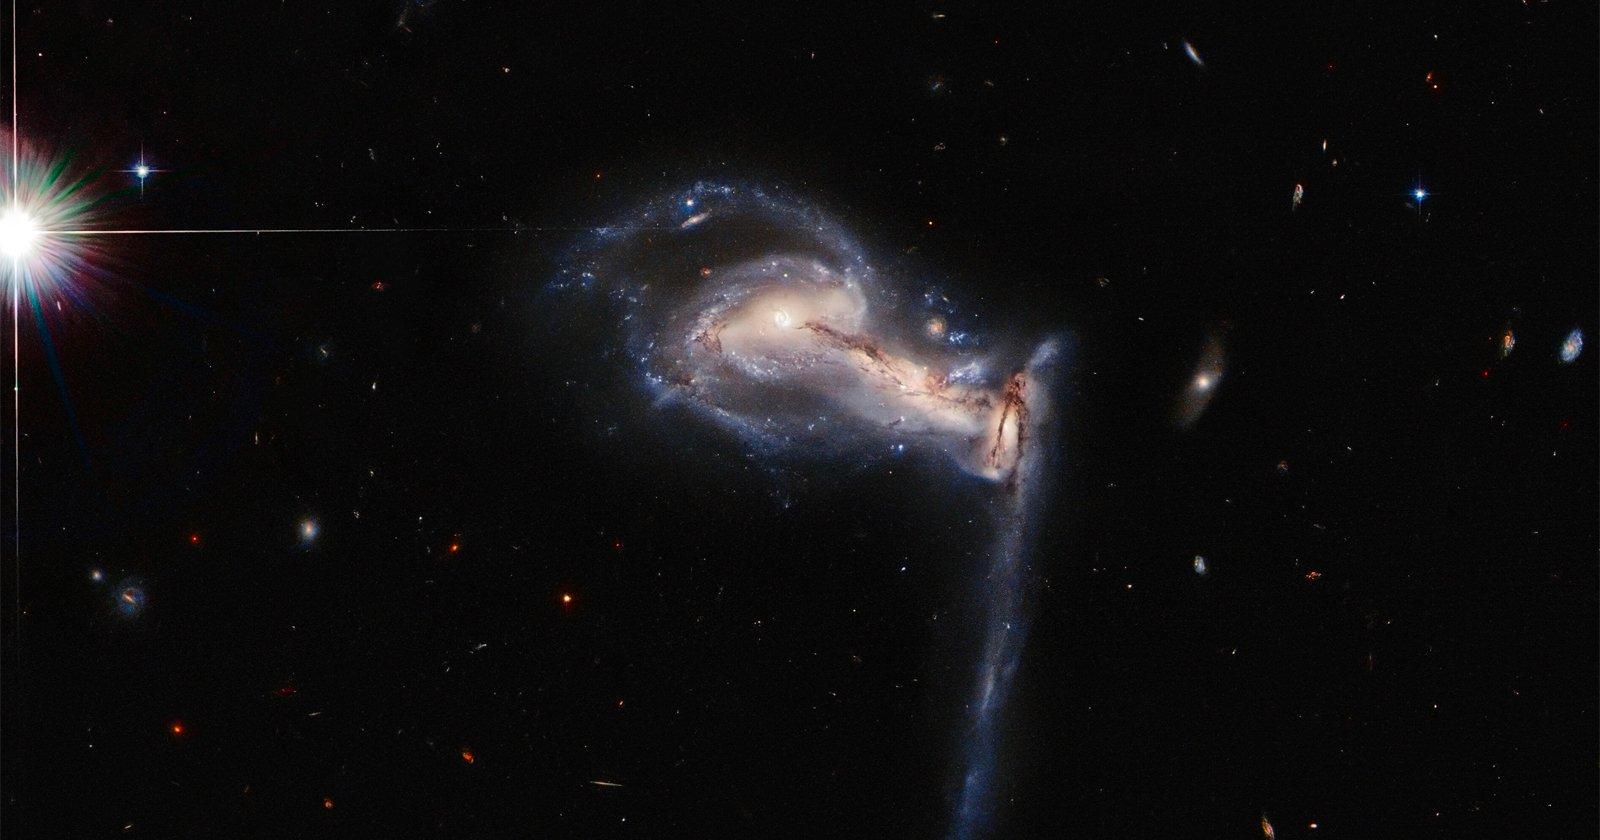 Hubble Captures 'Gravitational Tug-of-War' Between Three Galaxies